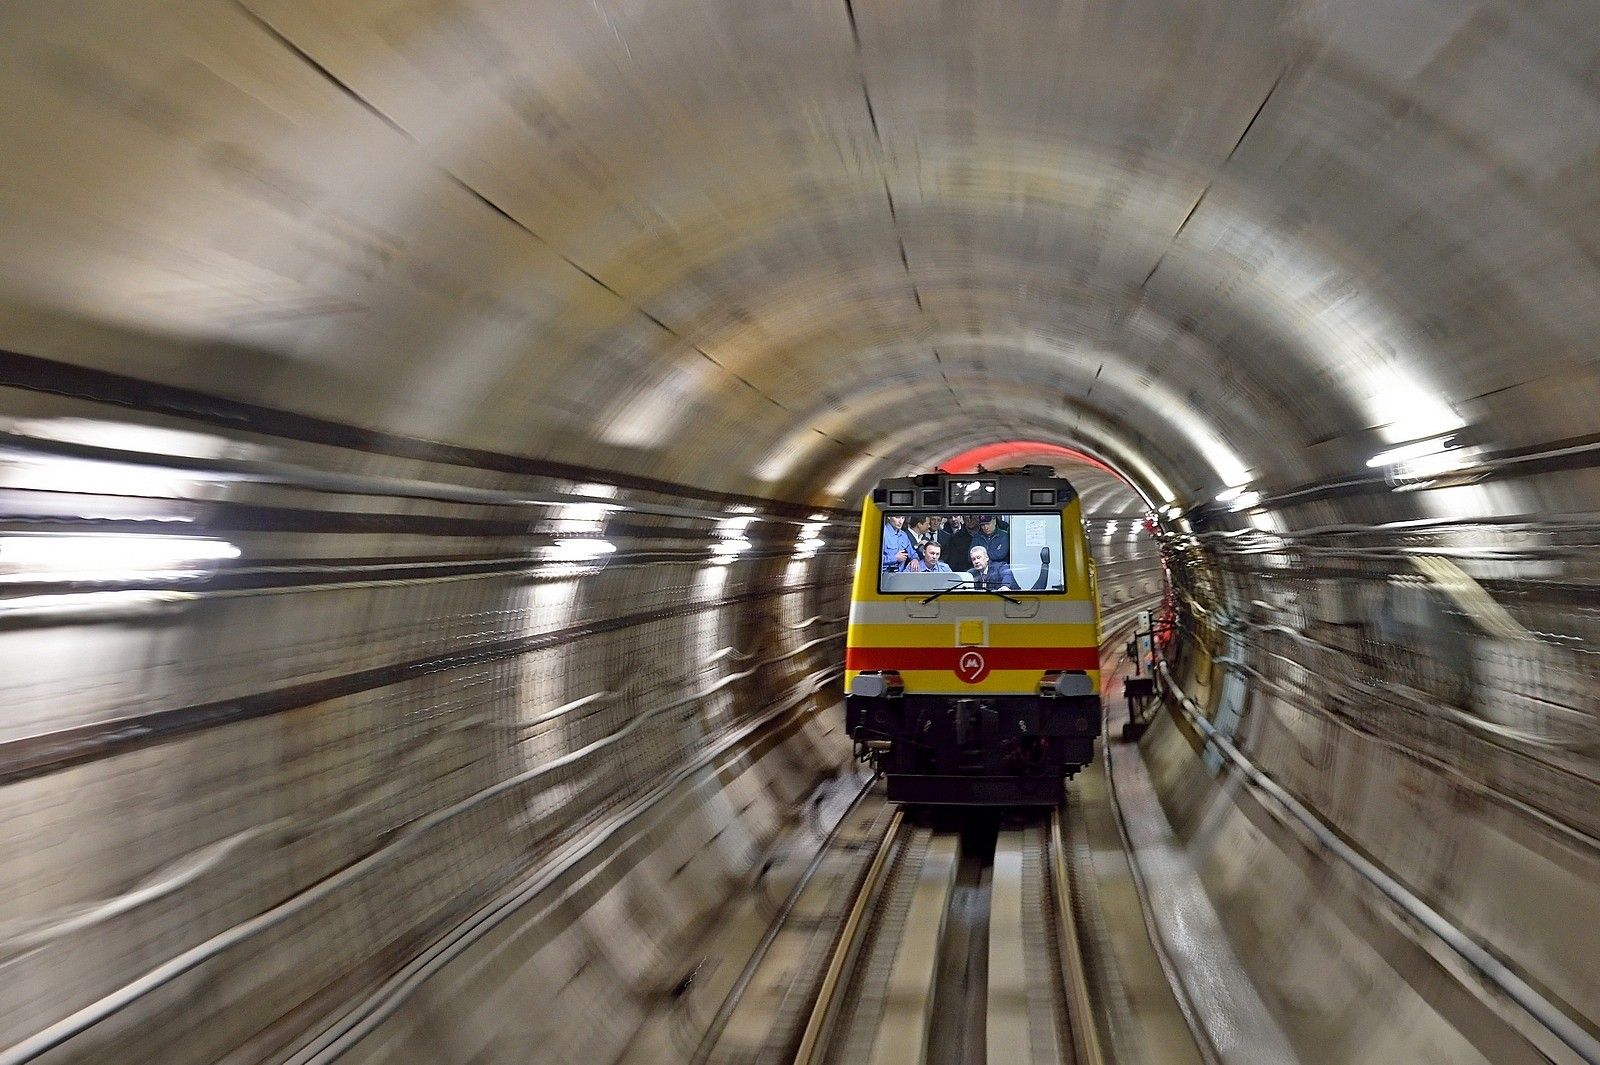 Собянин: 1-ый участок огромного кольца метро запустят через месяц-полтора